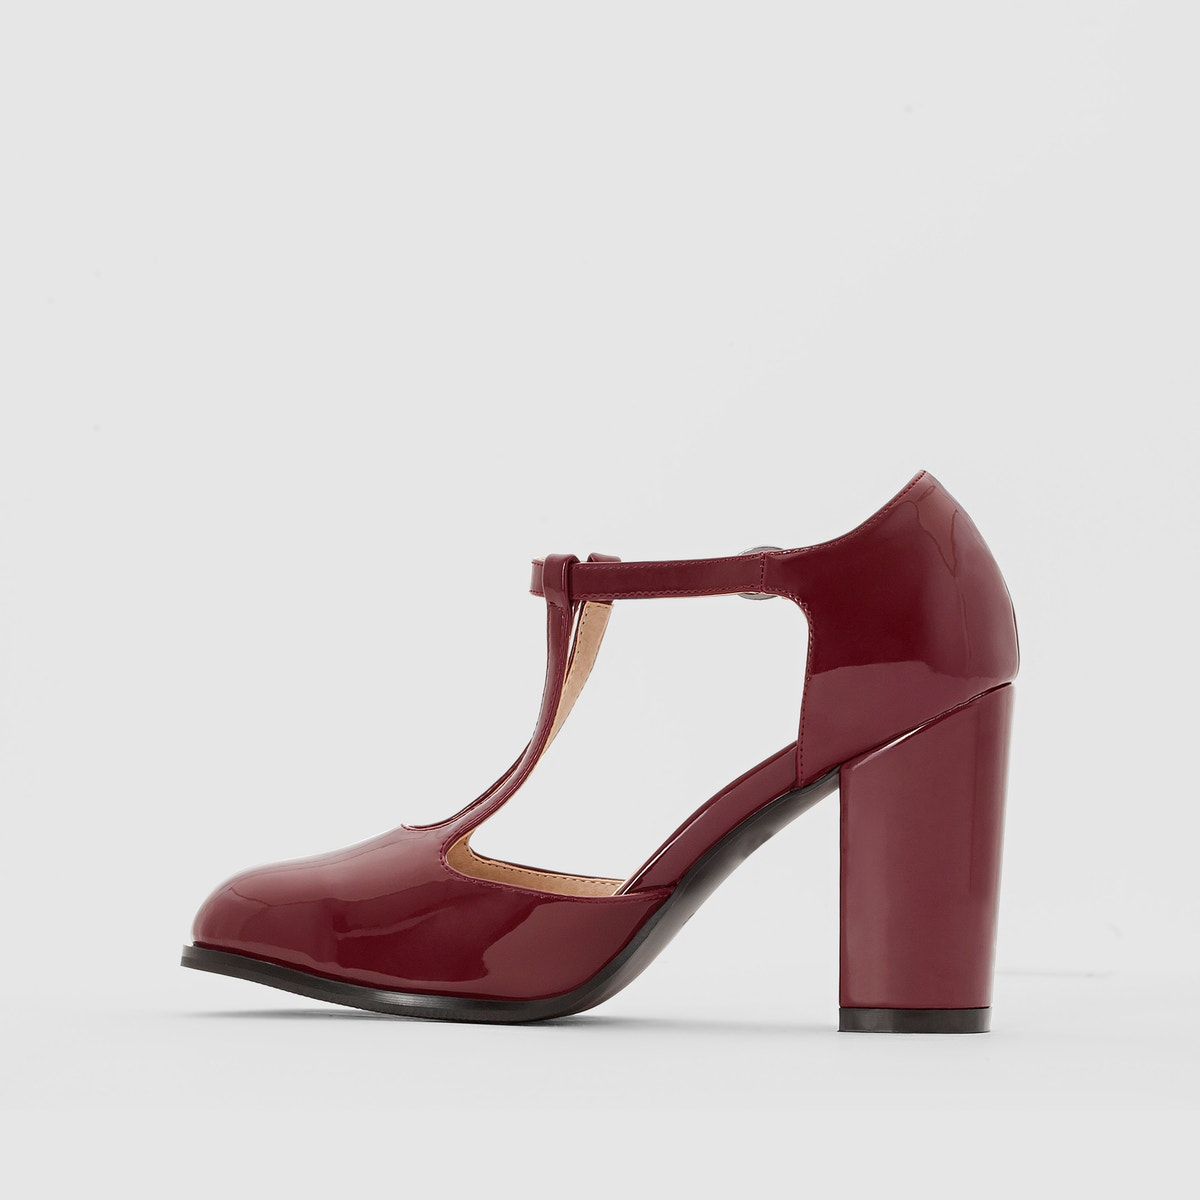 Castaluna Castaluna Castaluna Womens Wide Fit Patent Heels c9f077